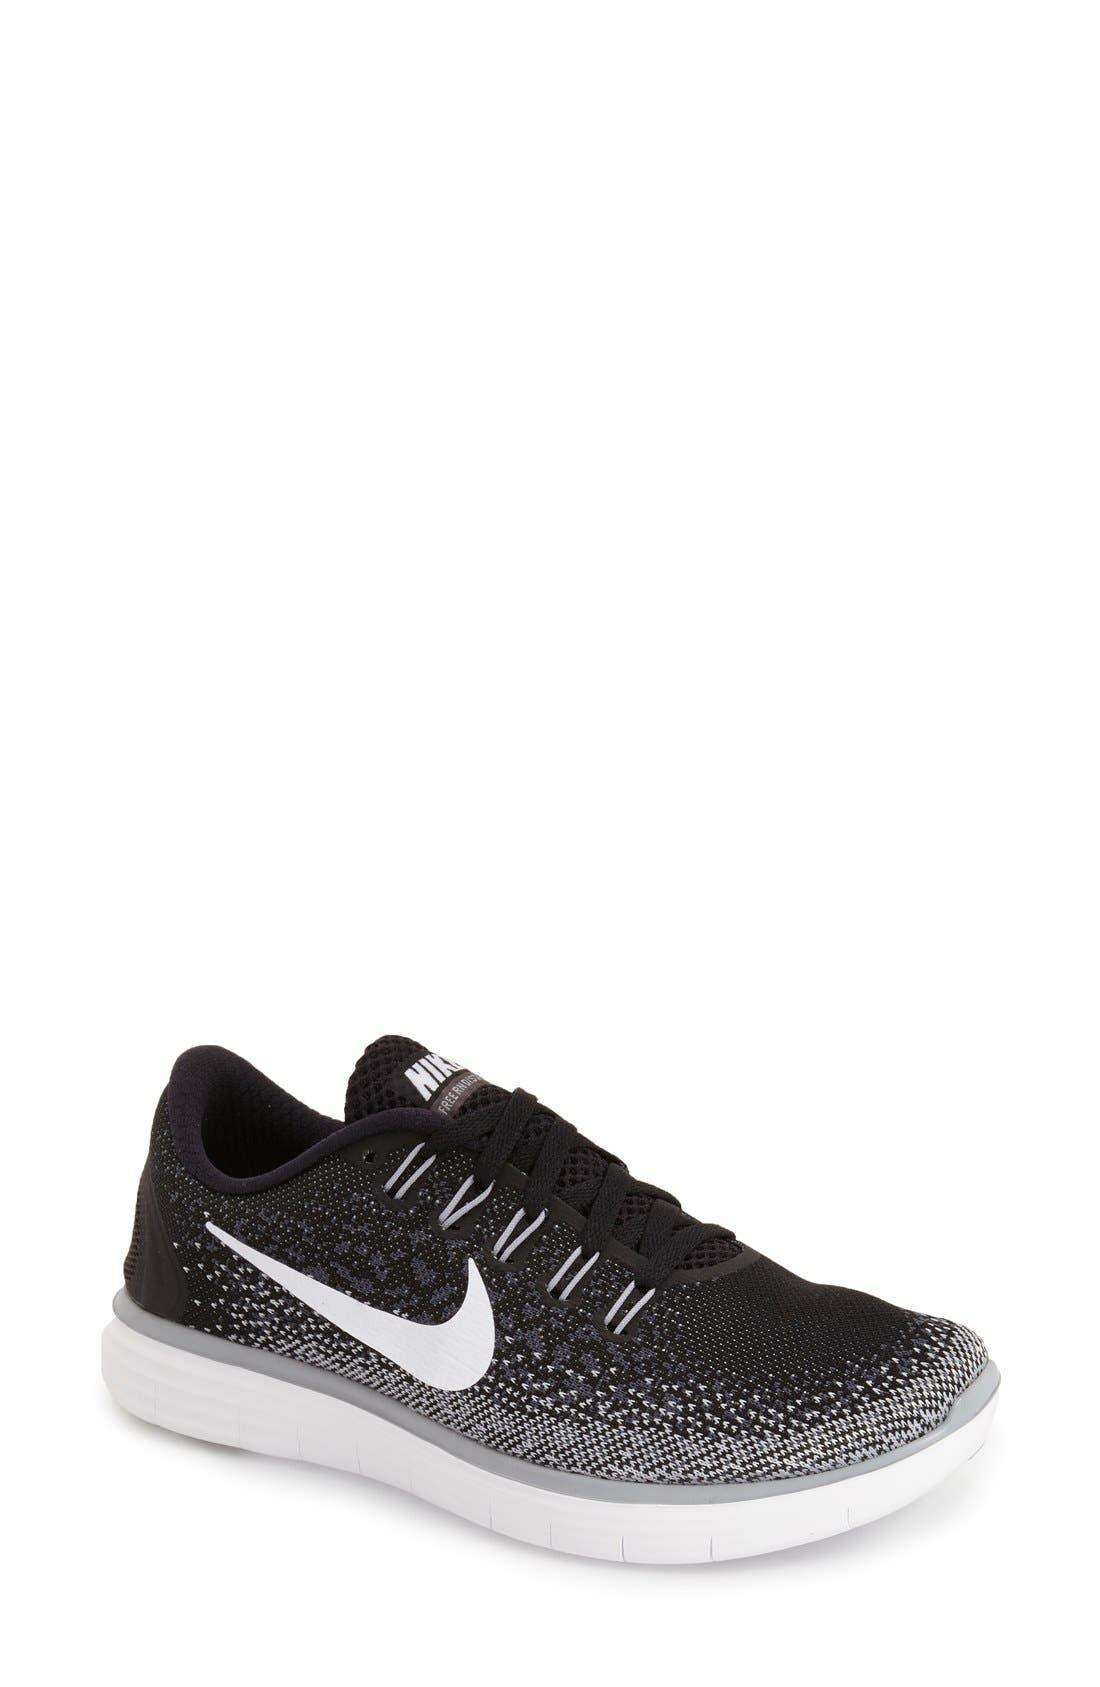 Alternate Image 1 Selected - Nike 'Free RN Distance' Running Shoe (Women)